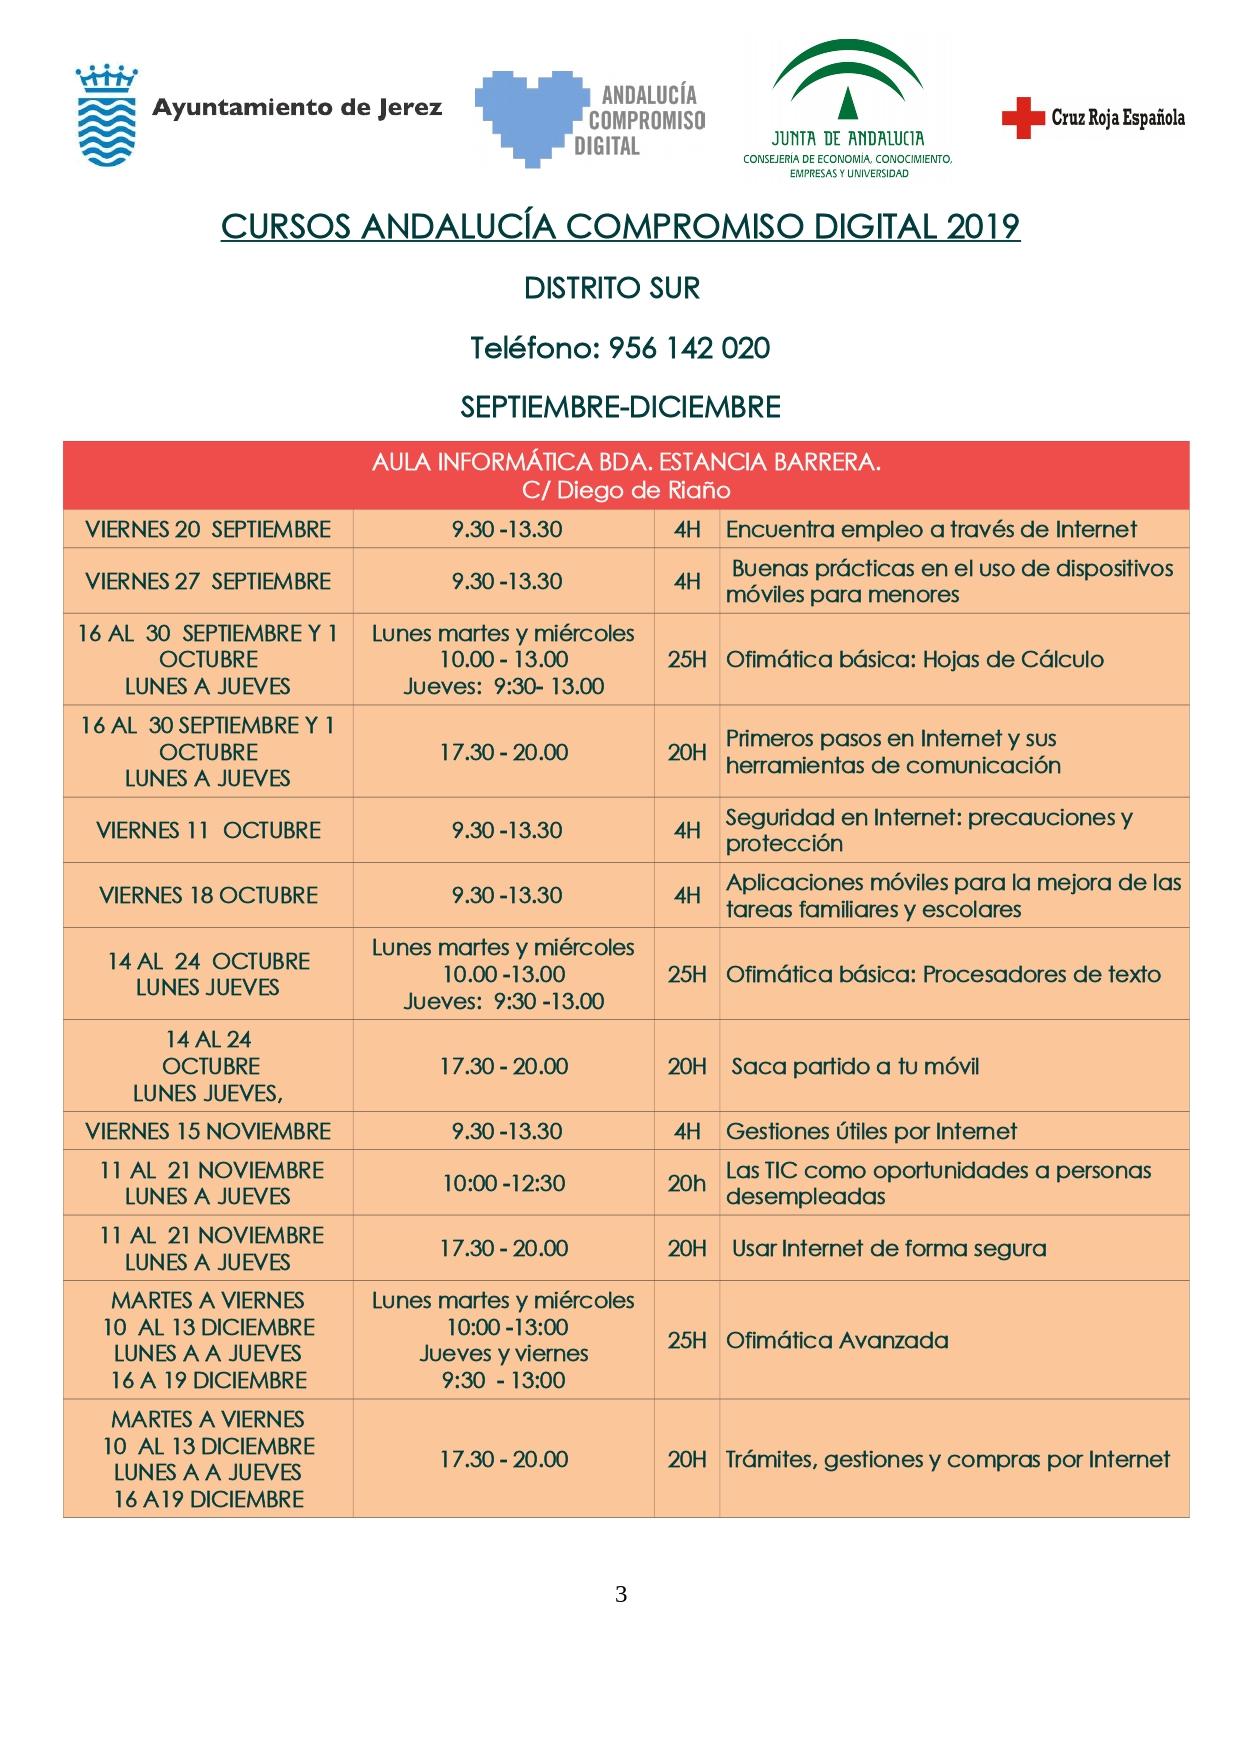 Cursos Andalucía Compromiso Digital. Tercer trimestre 2019. Zona Sur